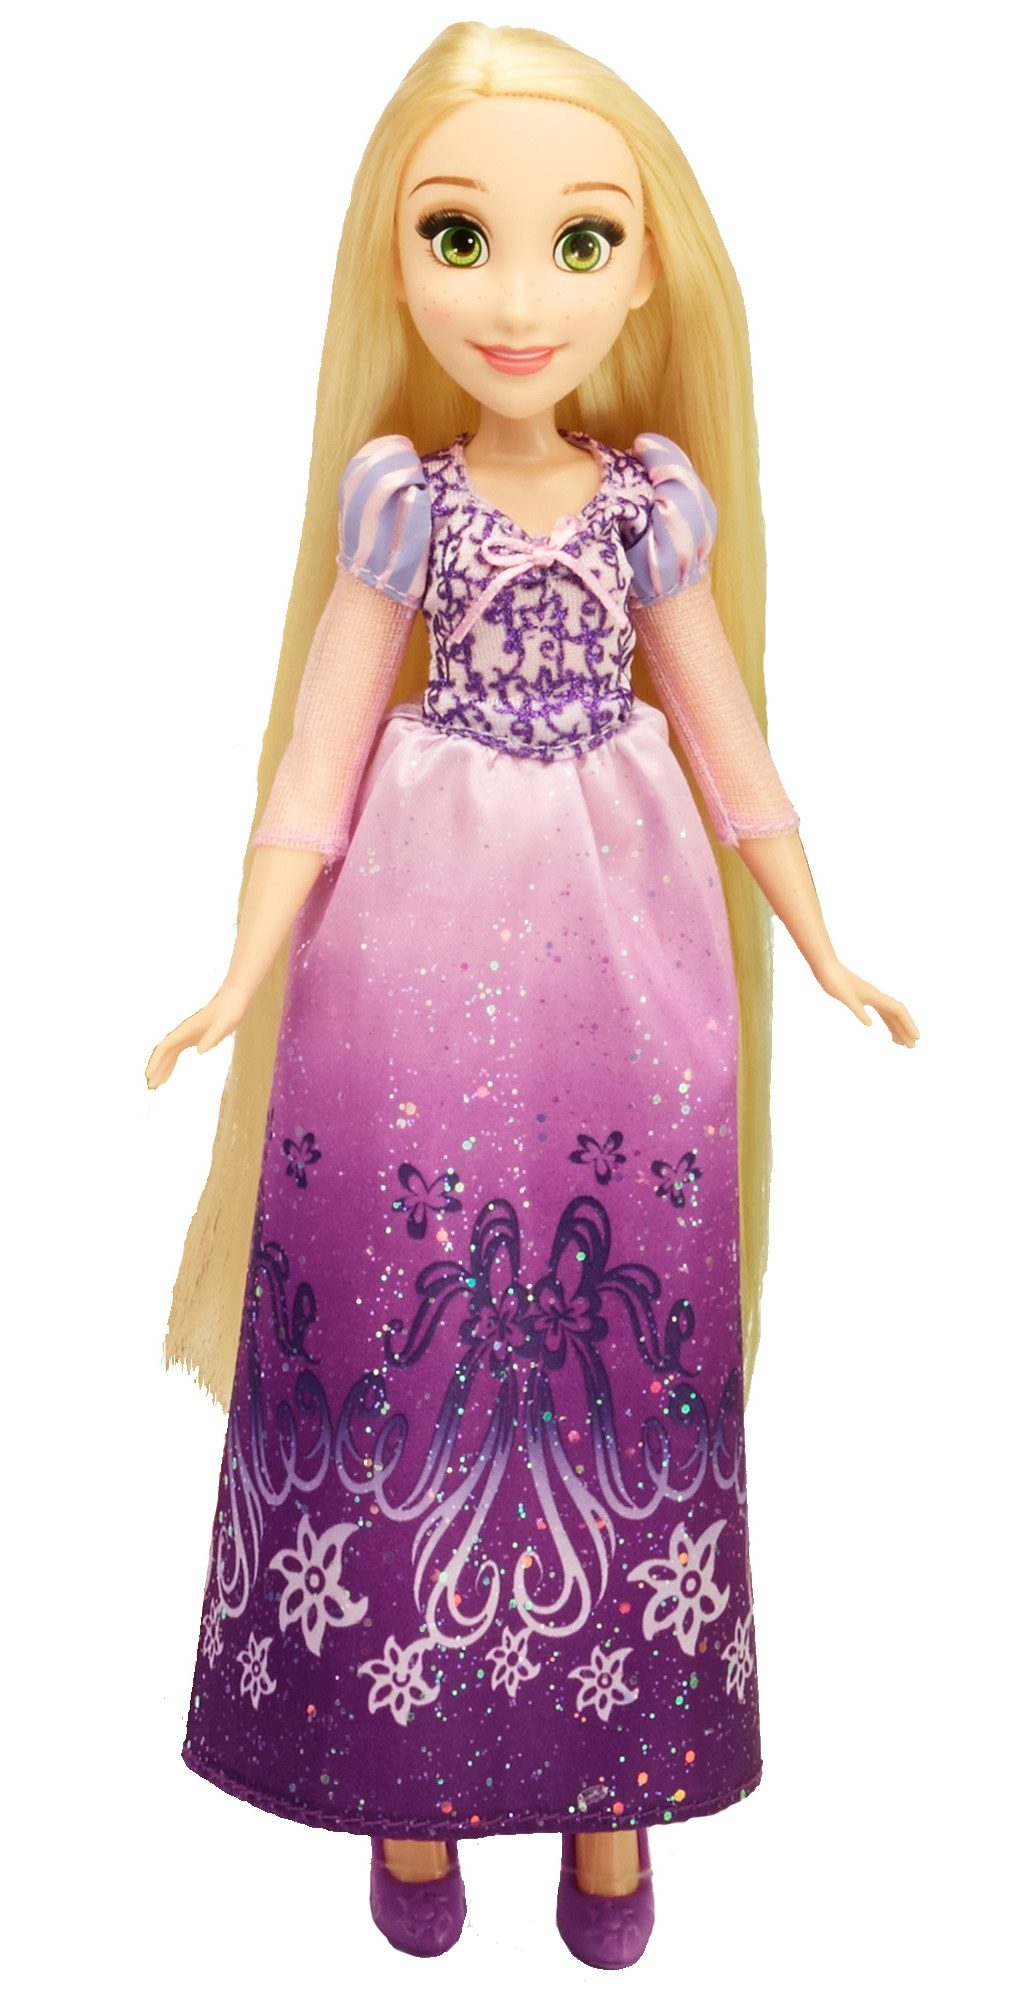 Hasbro Puppe 27 cm, »Disney Princess - Schimmerglanz Rapunzel«